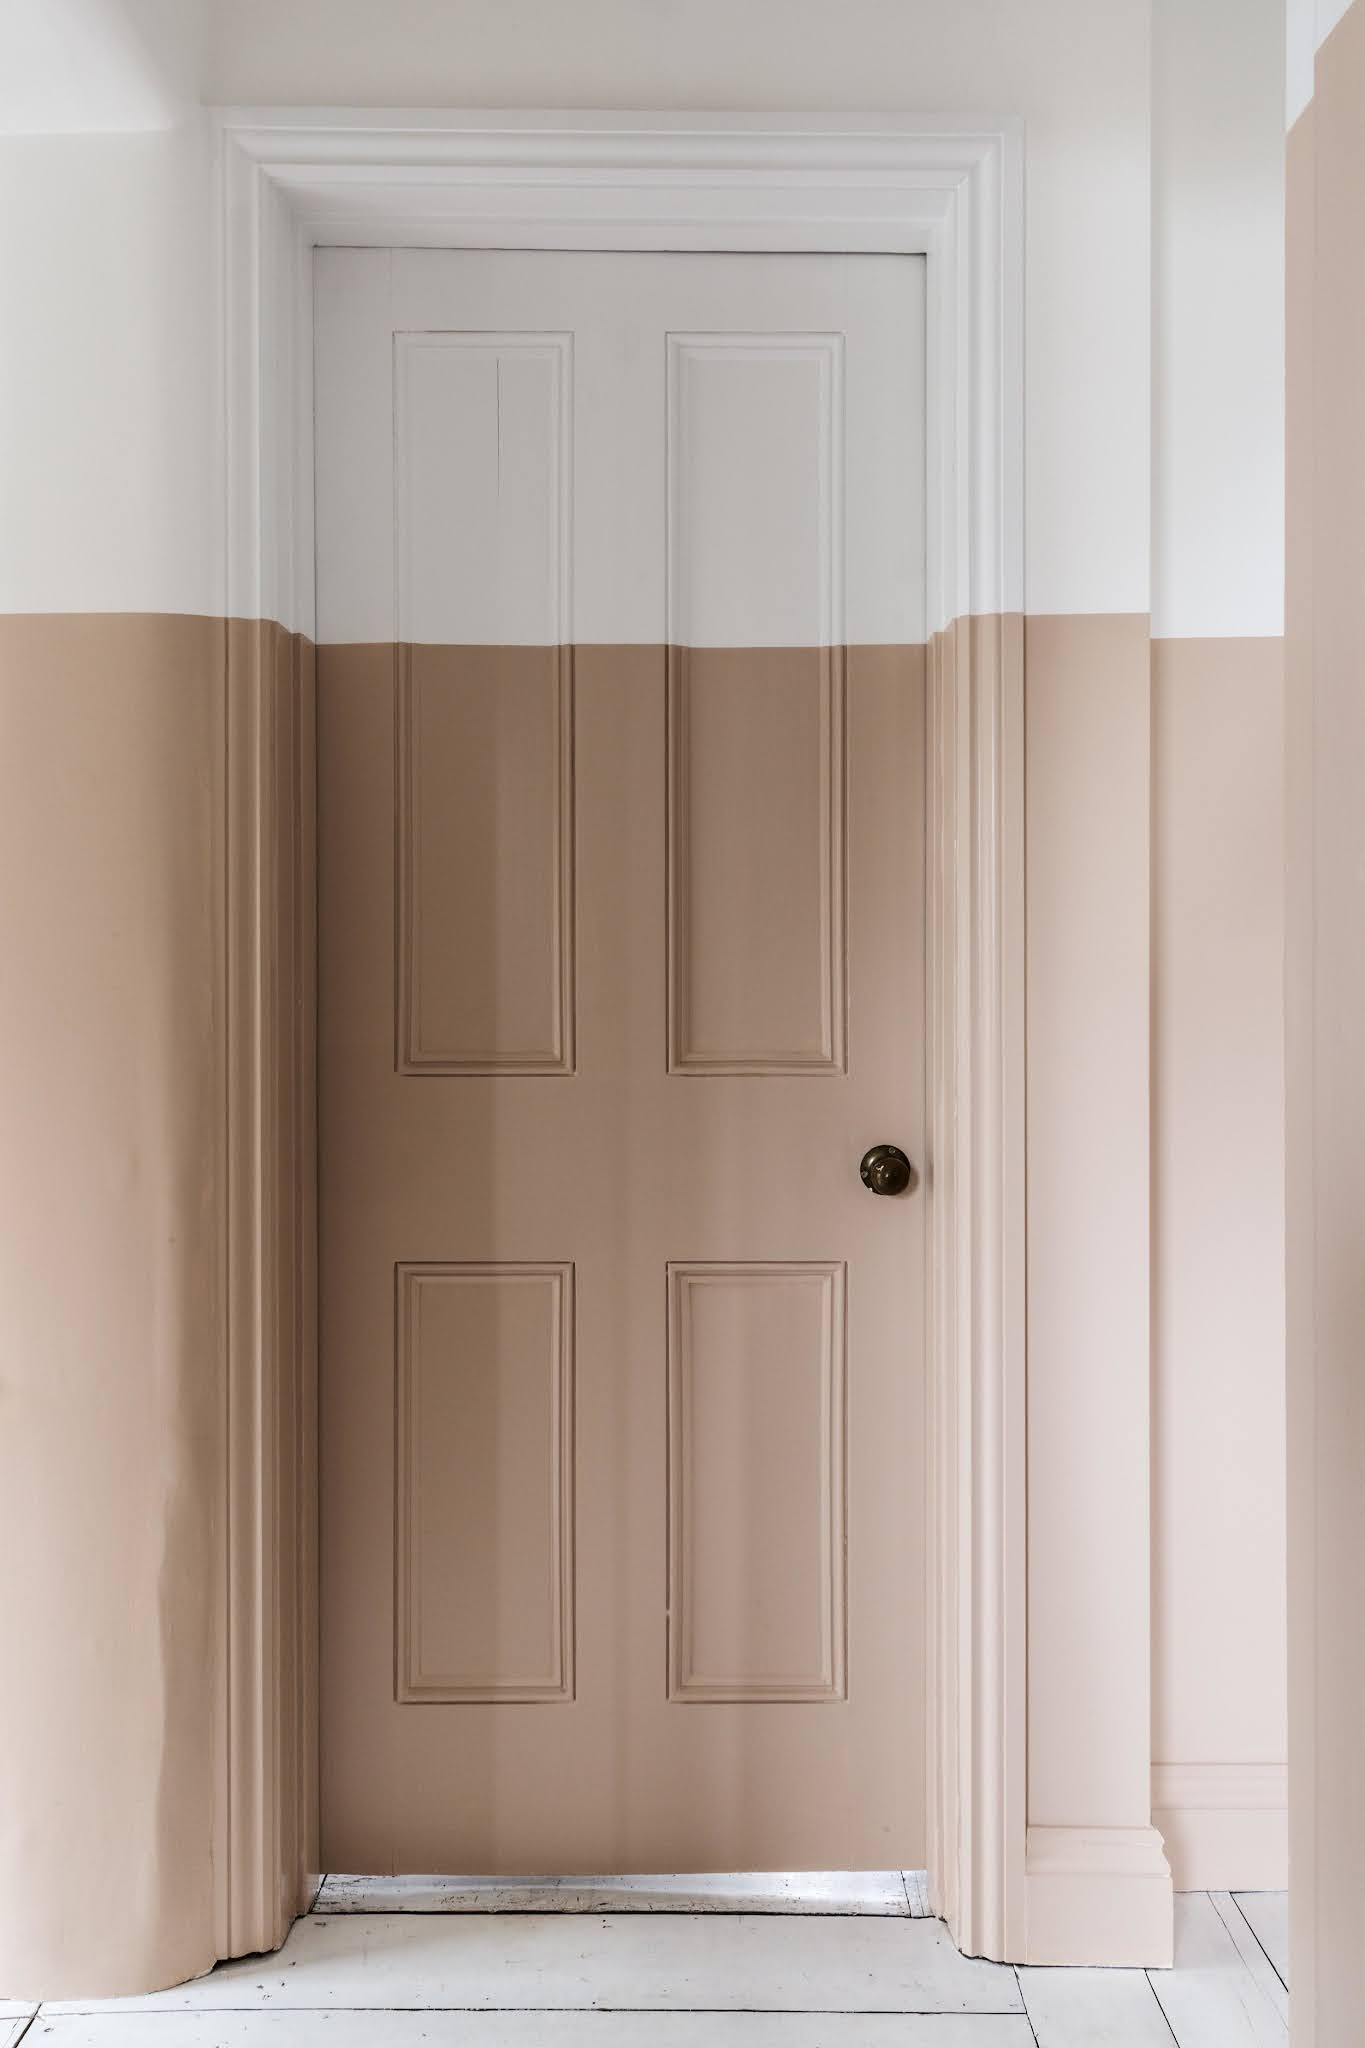 ilaria fatone - un couloir en nude et blanc